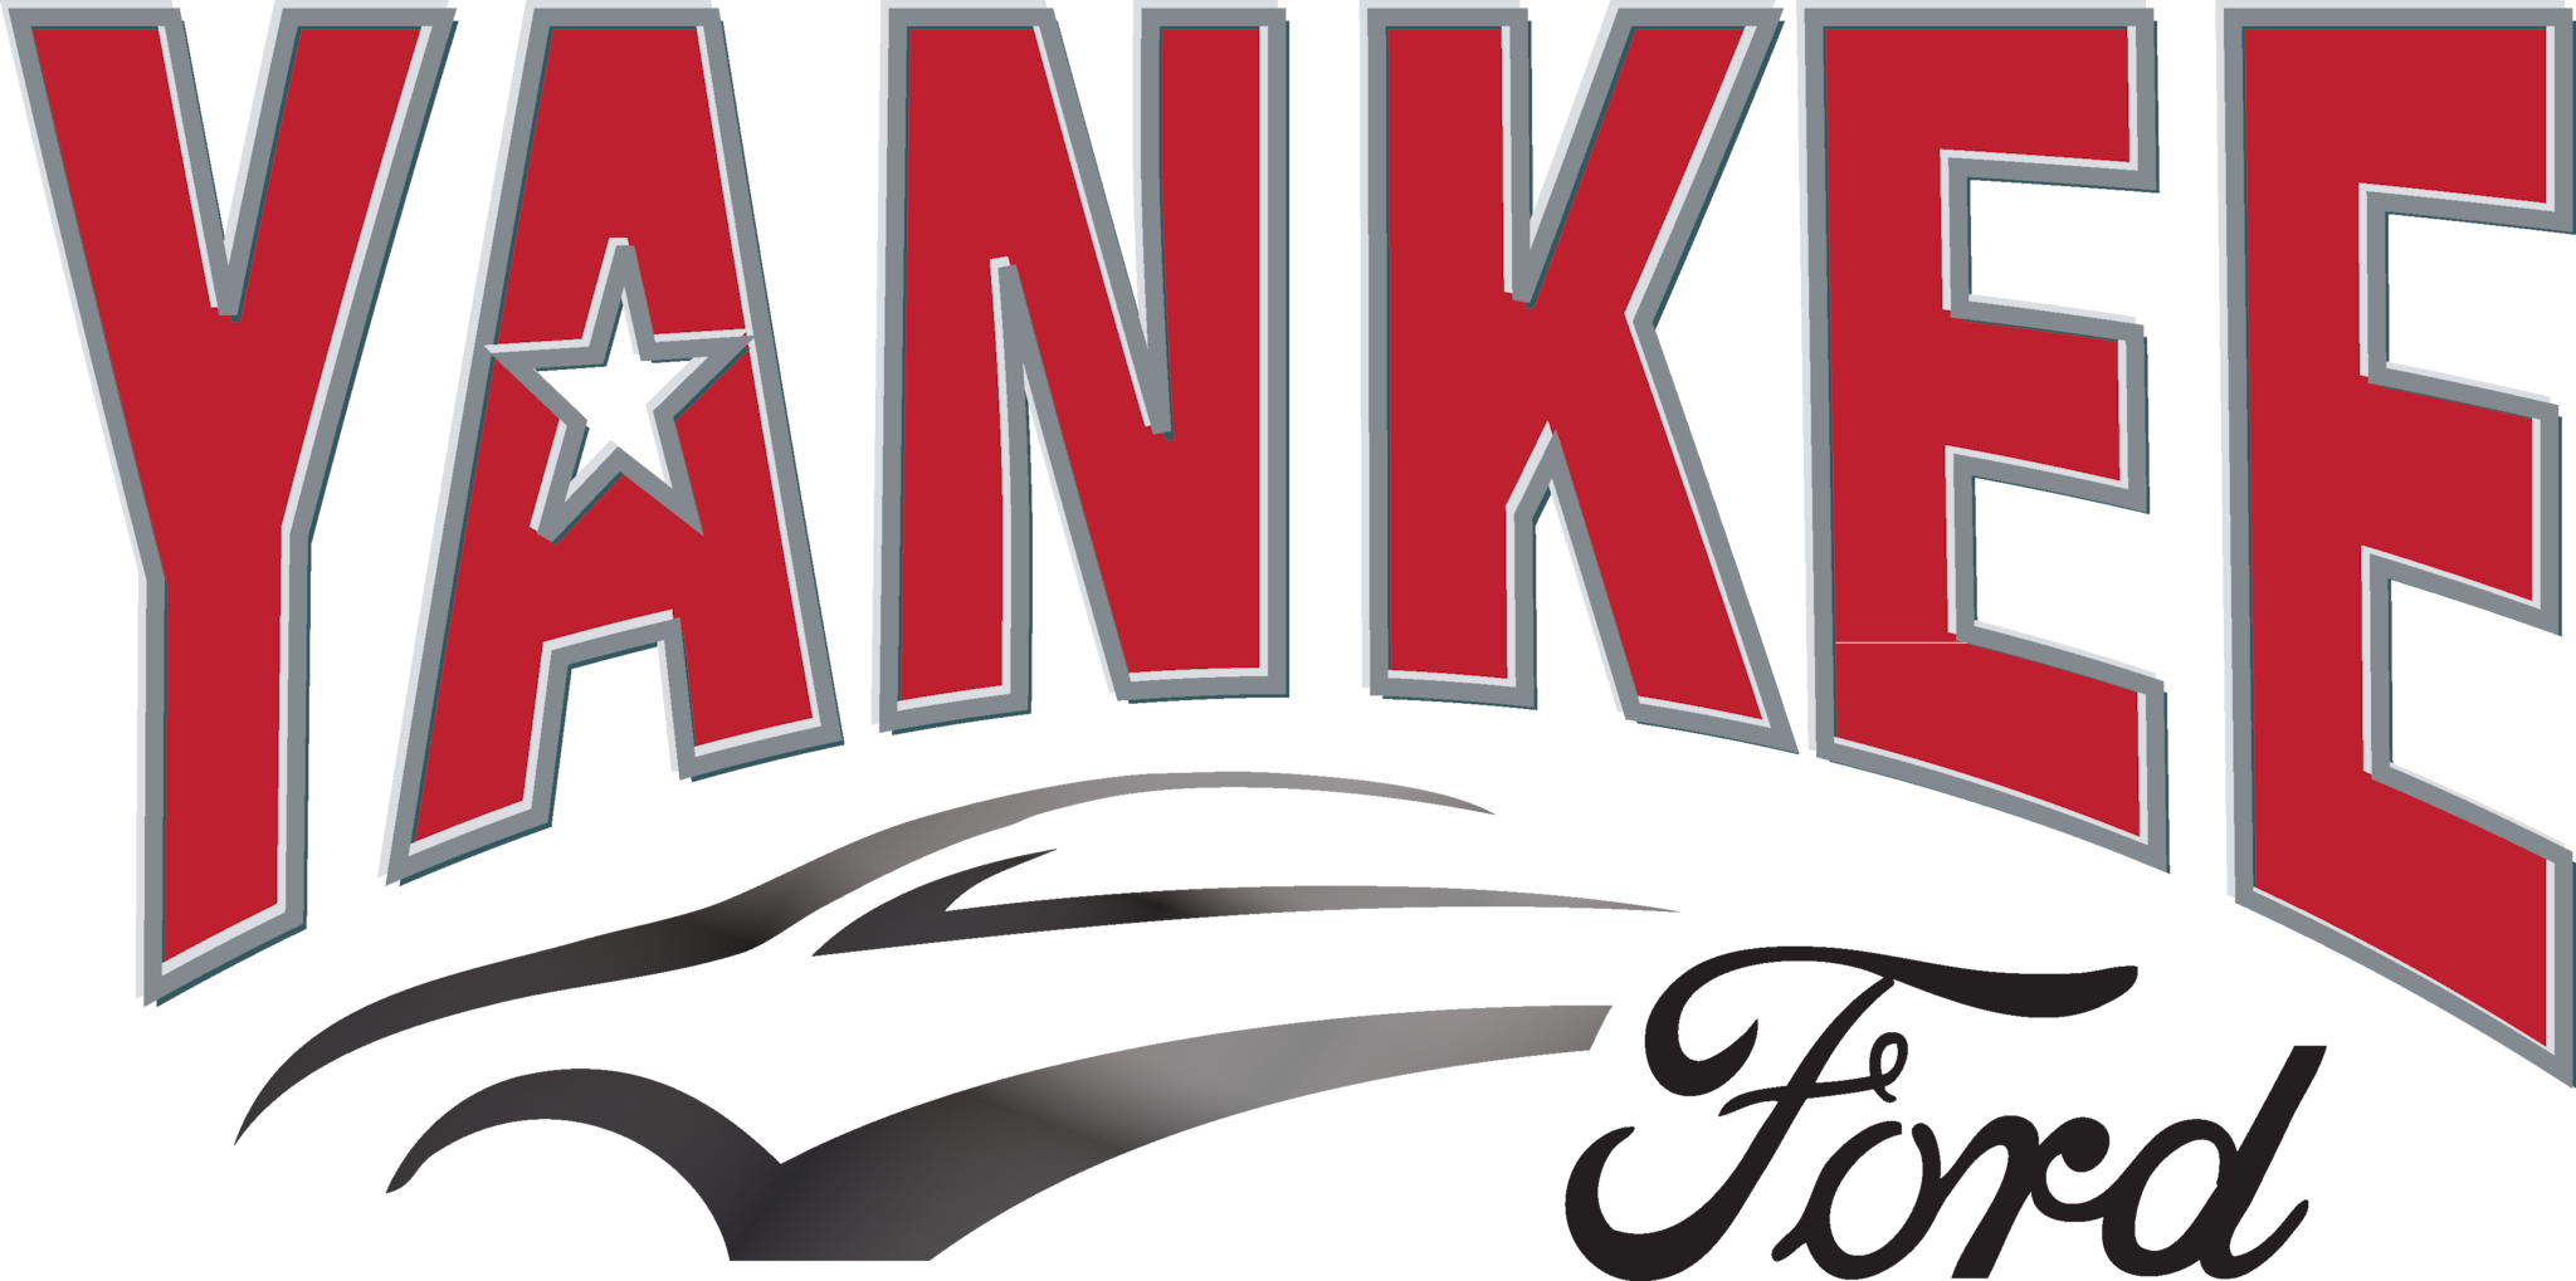 yankee logo 2